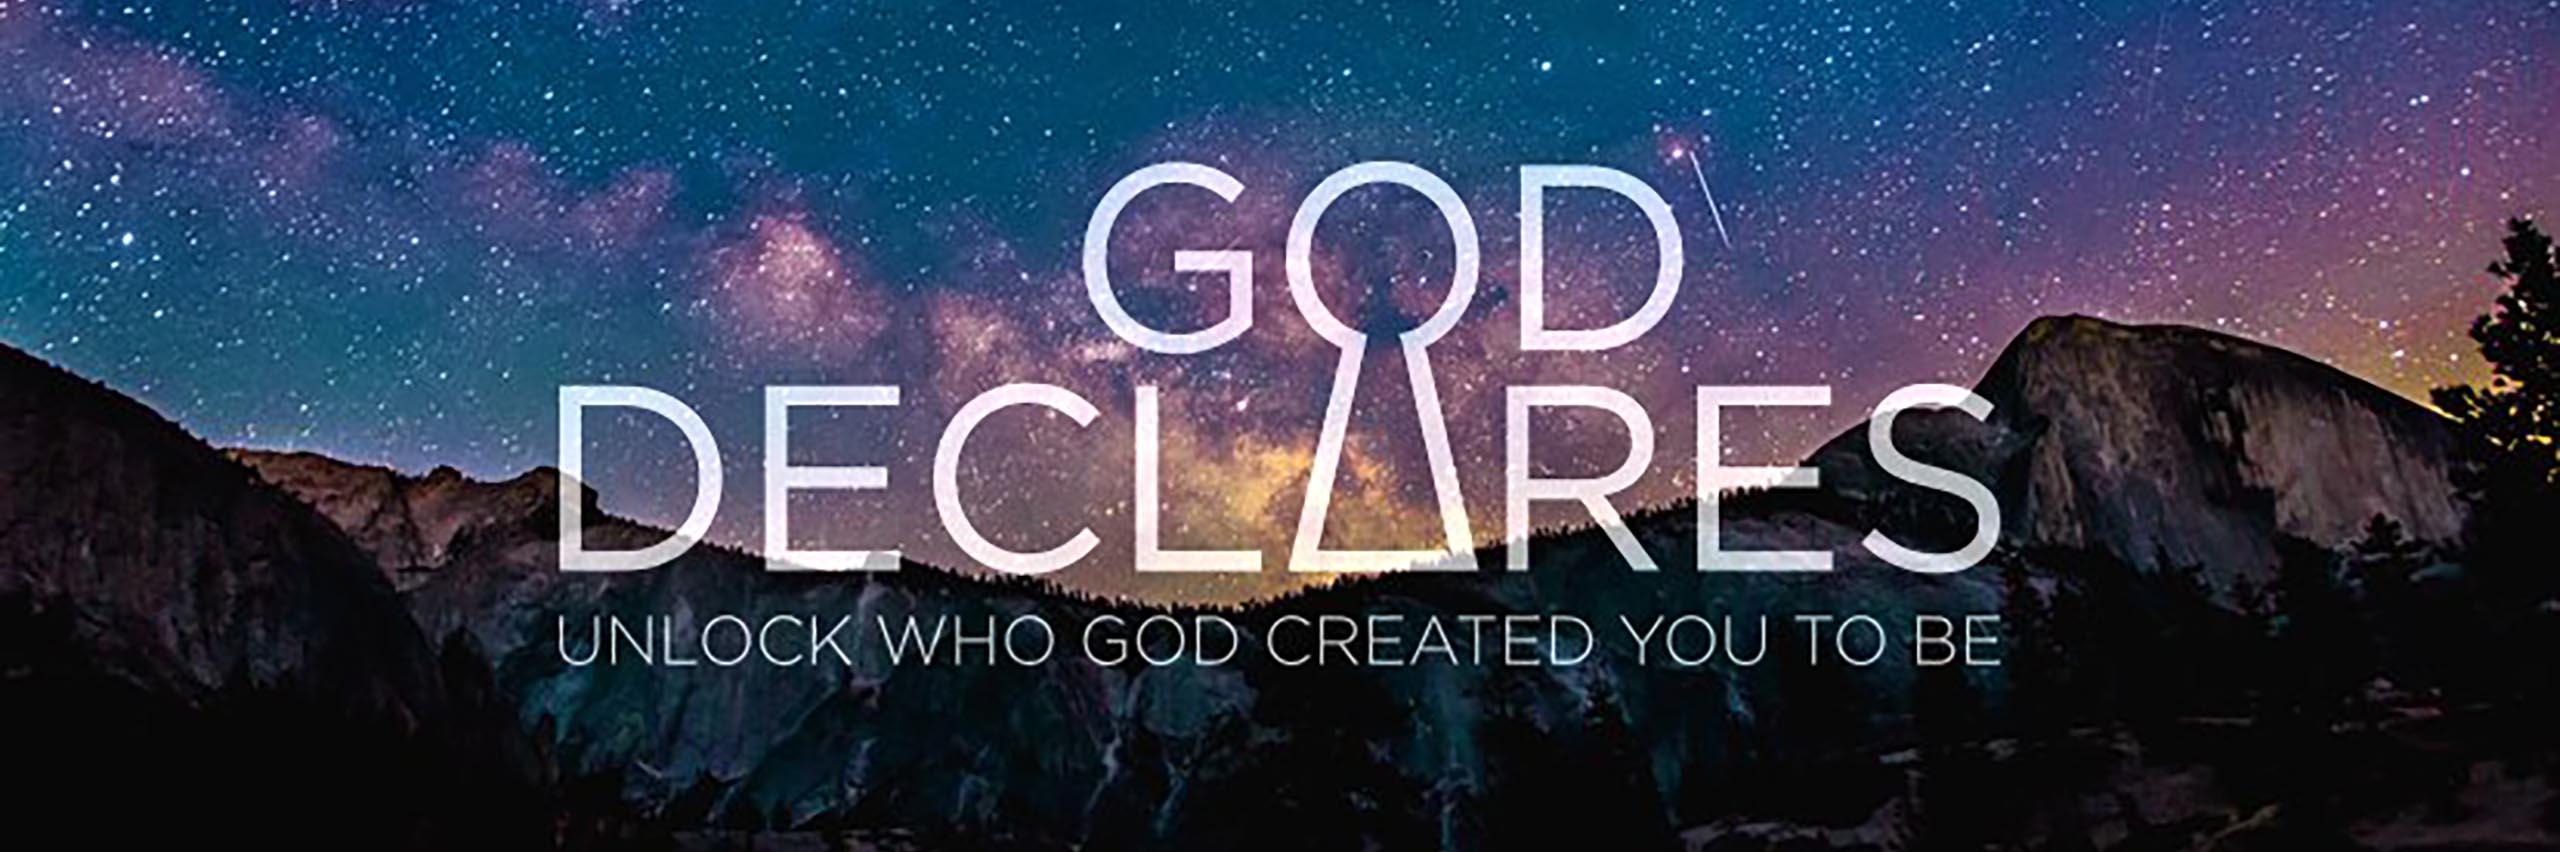 god_declares-header02